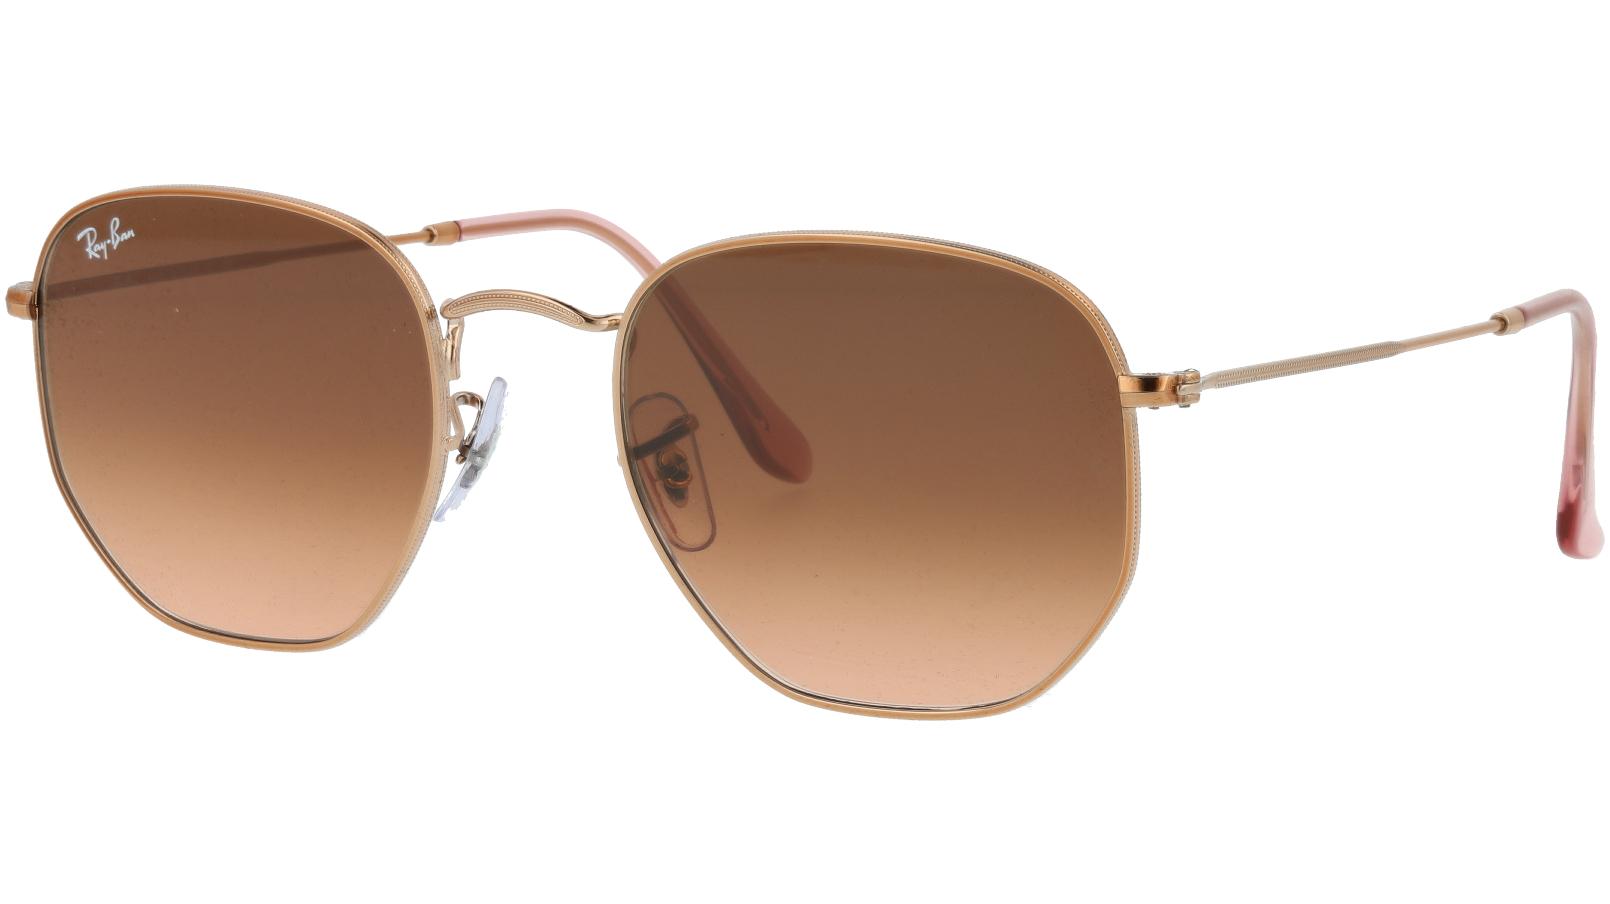 Ray-Ban RB3548N 9069A5 Copper Hexagonal Sunglasses